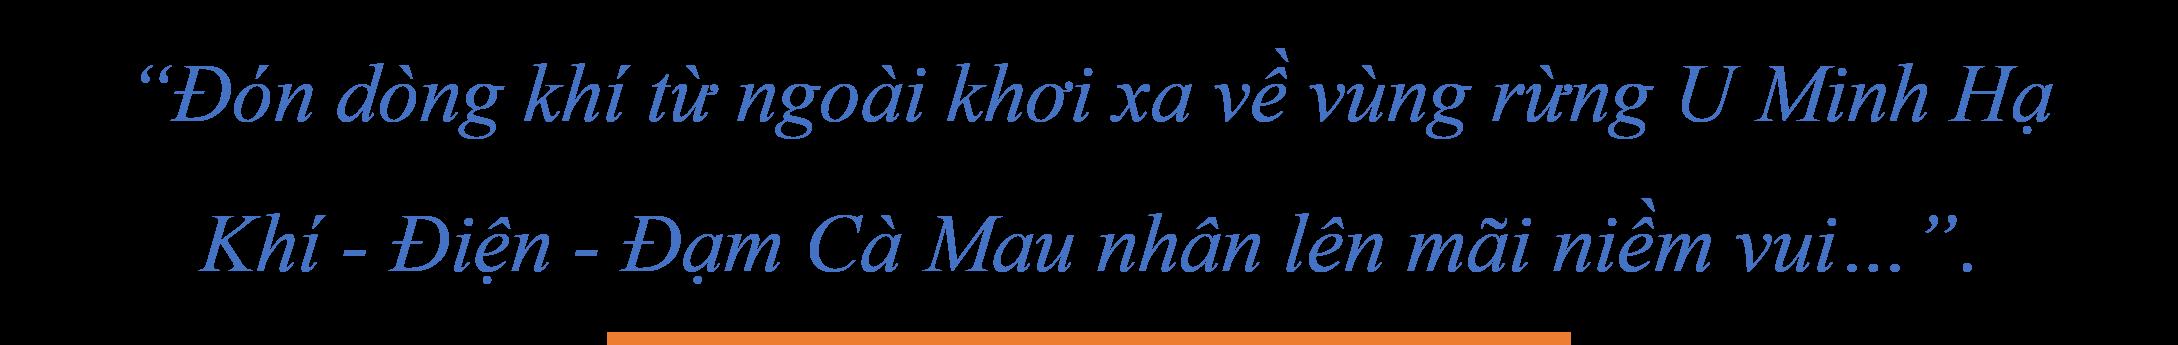 e magazine pvn cong cu dieu tiet kinh te vi mo quan trong cua chinh phu